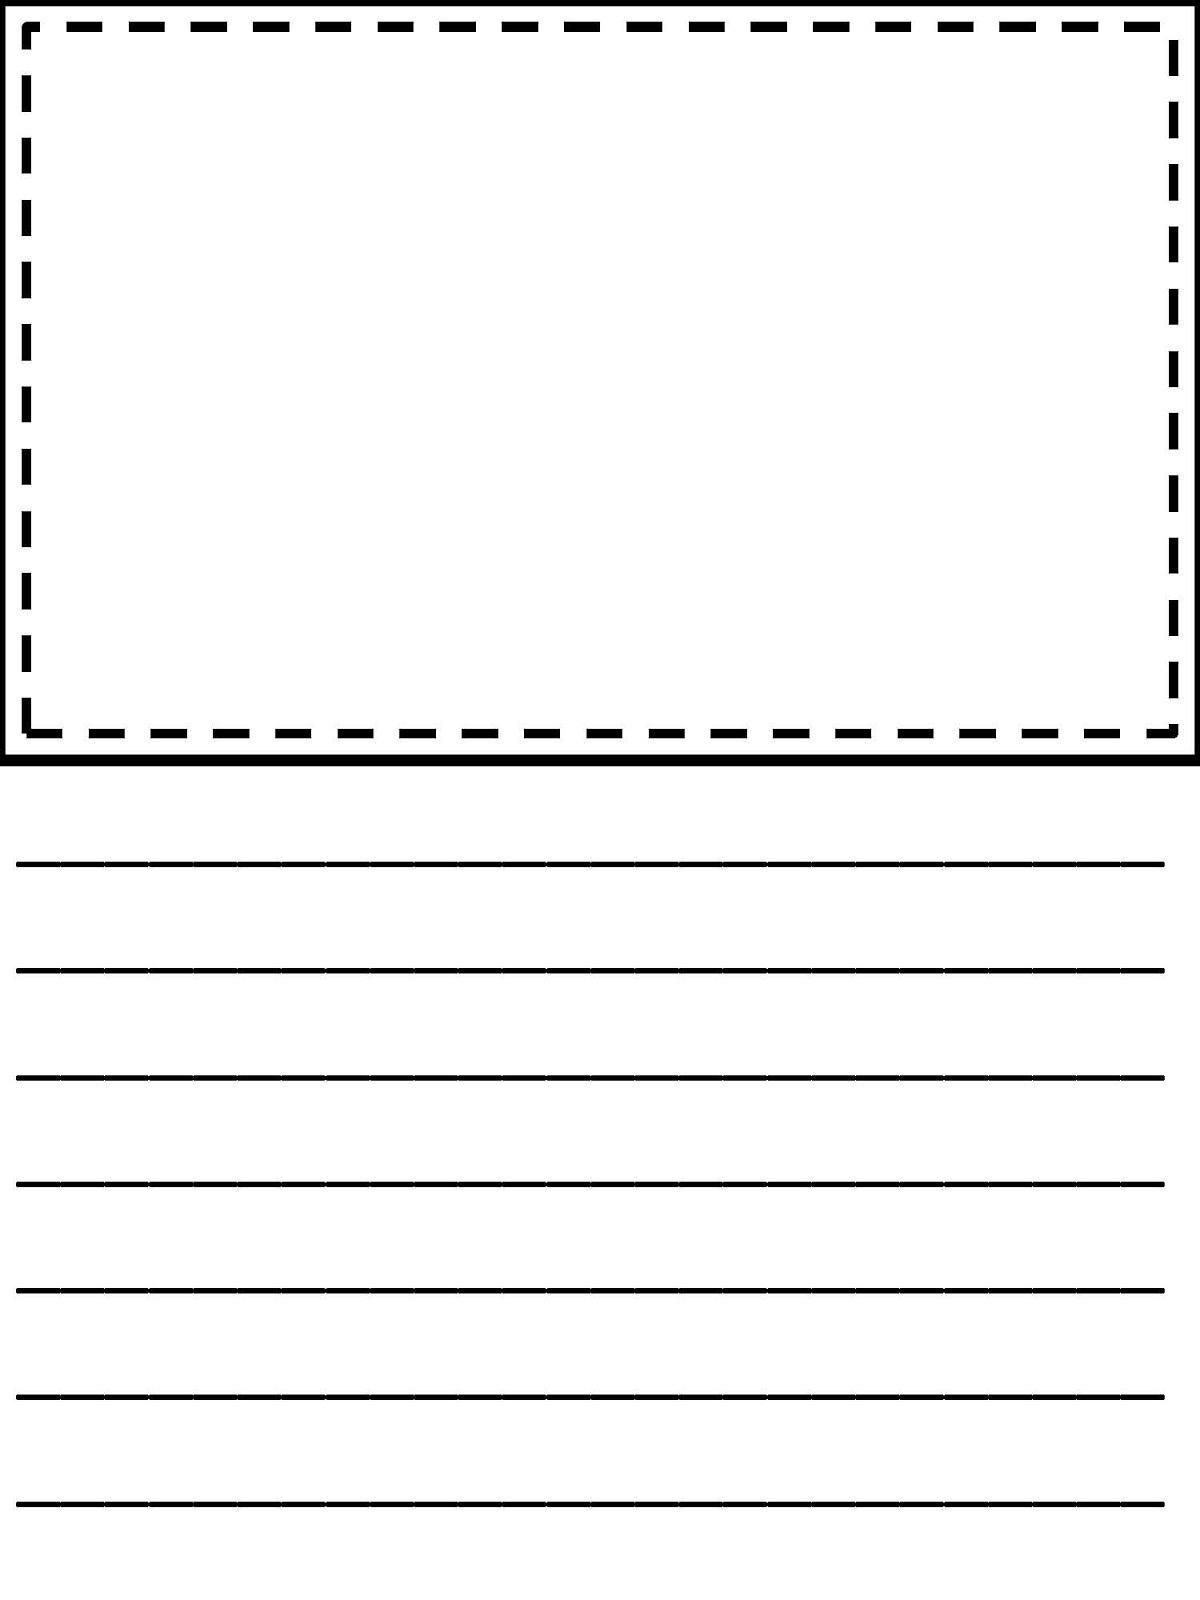 Third Grade Writing Paper | Homeshealth Handwriting Template - Free Printable Handwriting Paper